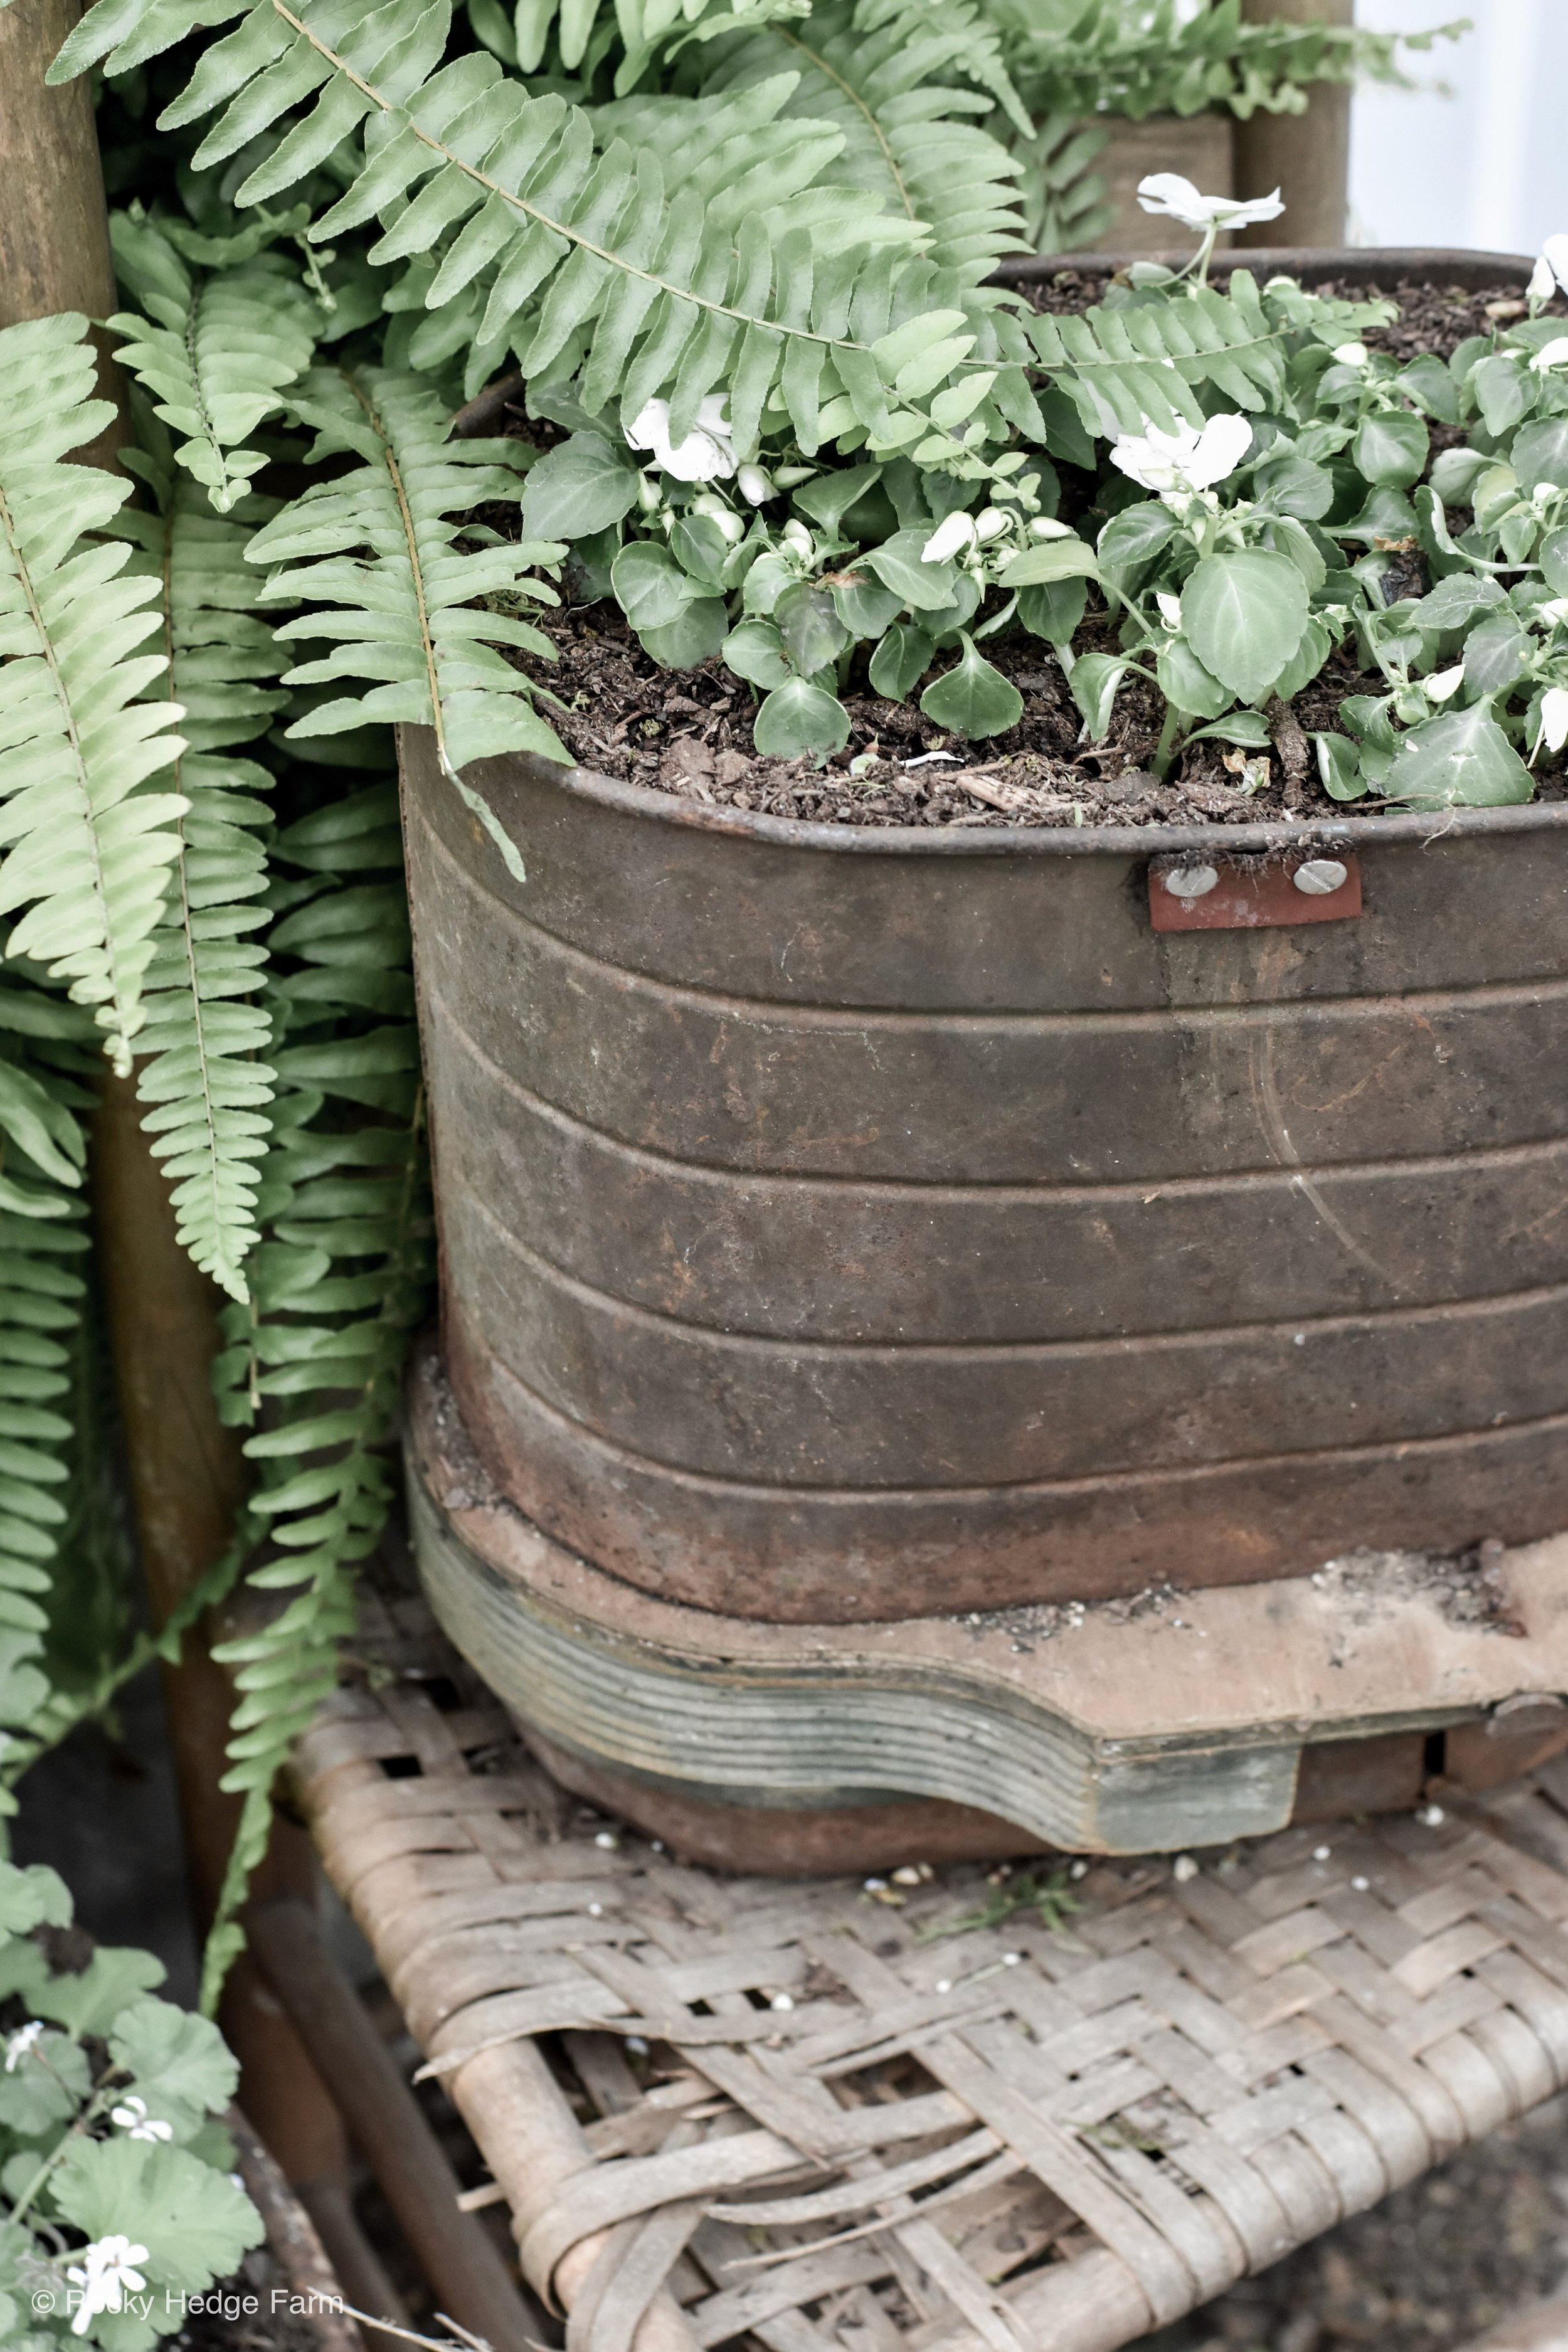 Antique Seed Planter | Rocky Hedge Farm